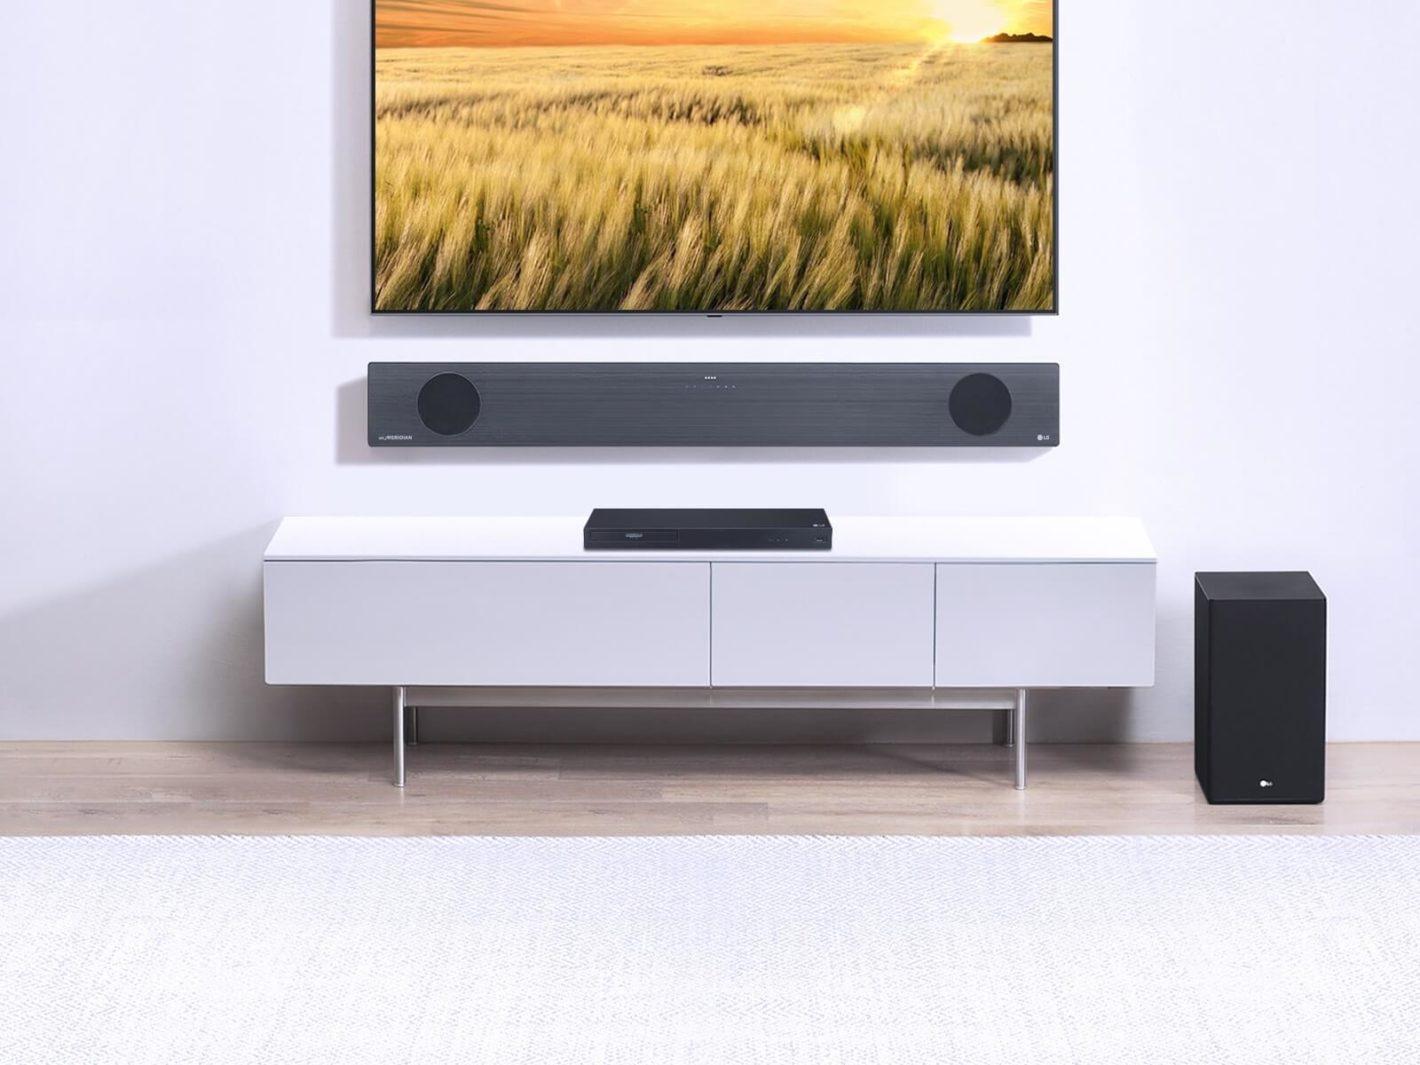 LG-SL9YG-Soundbar-Google-Assistant-01-1-1420x1065